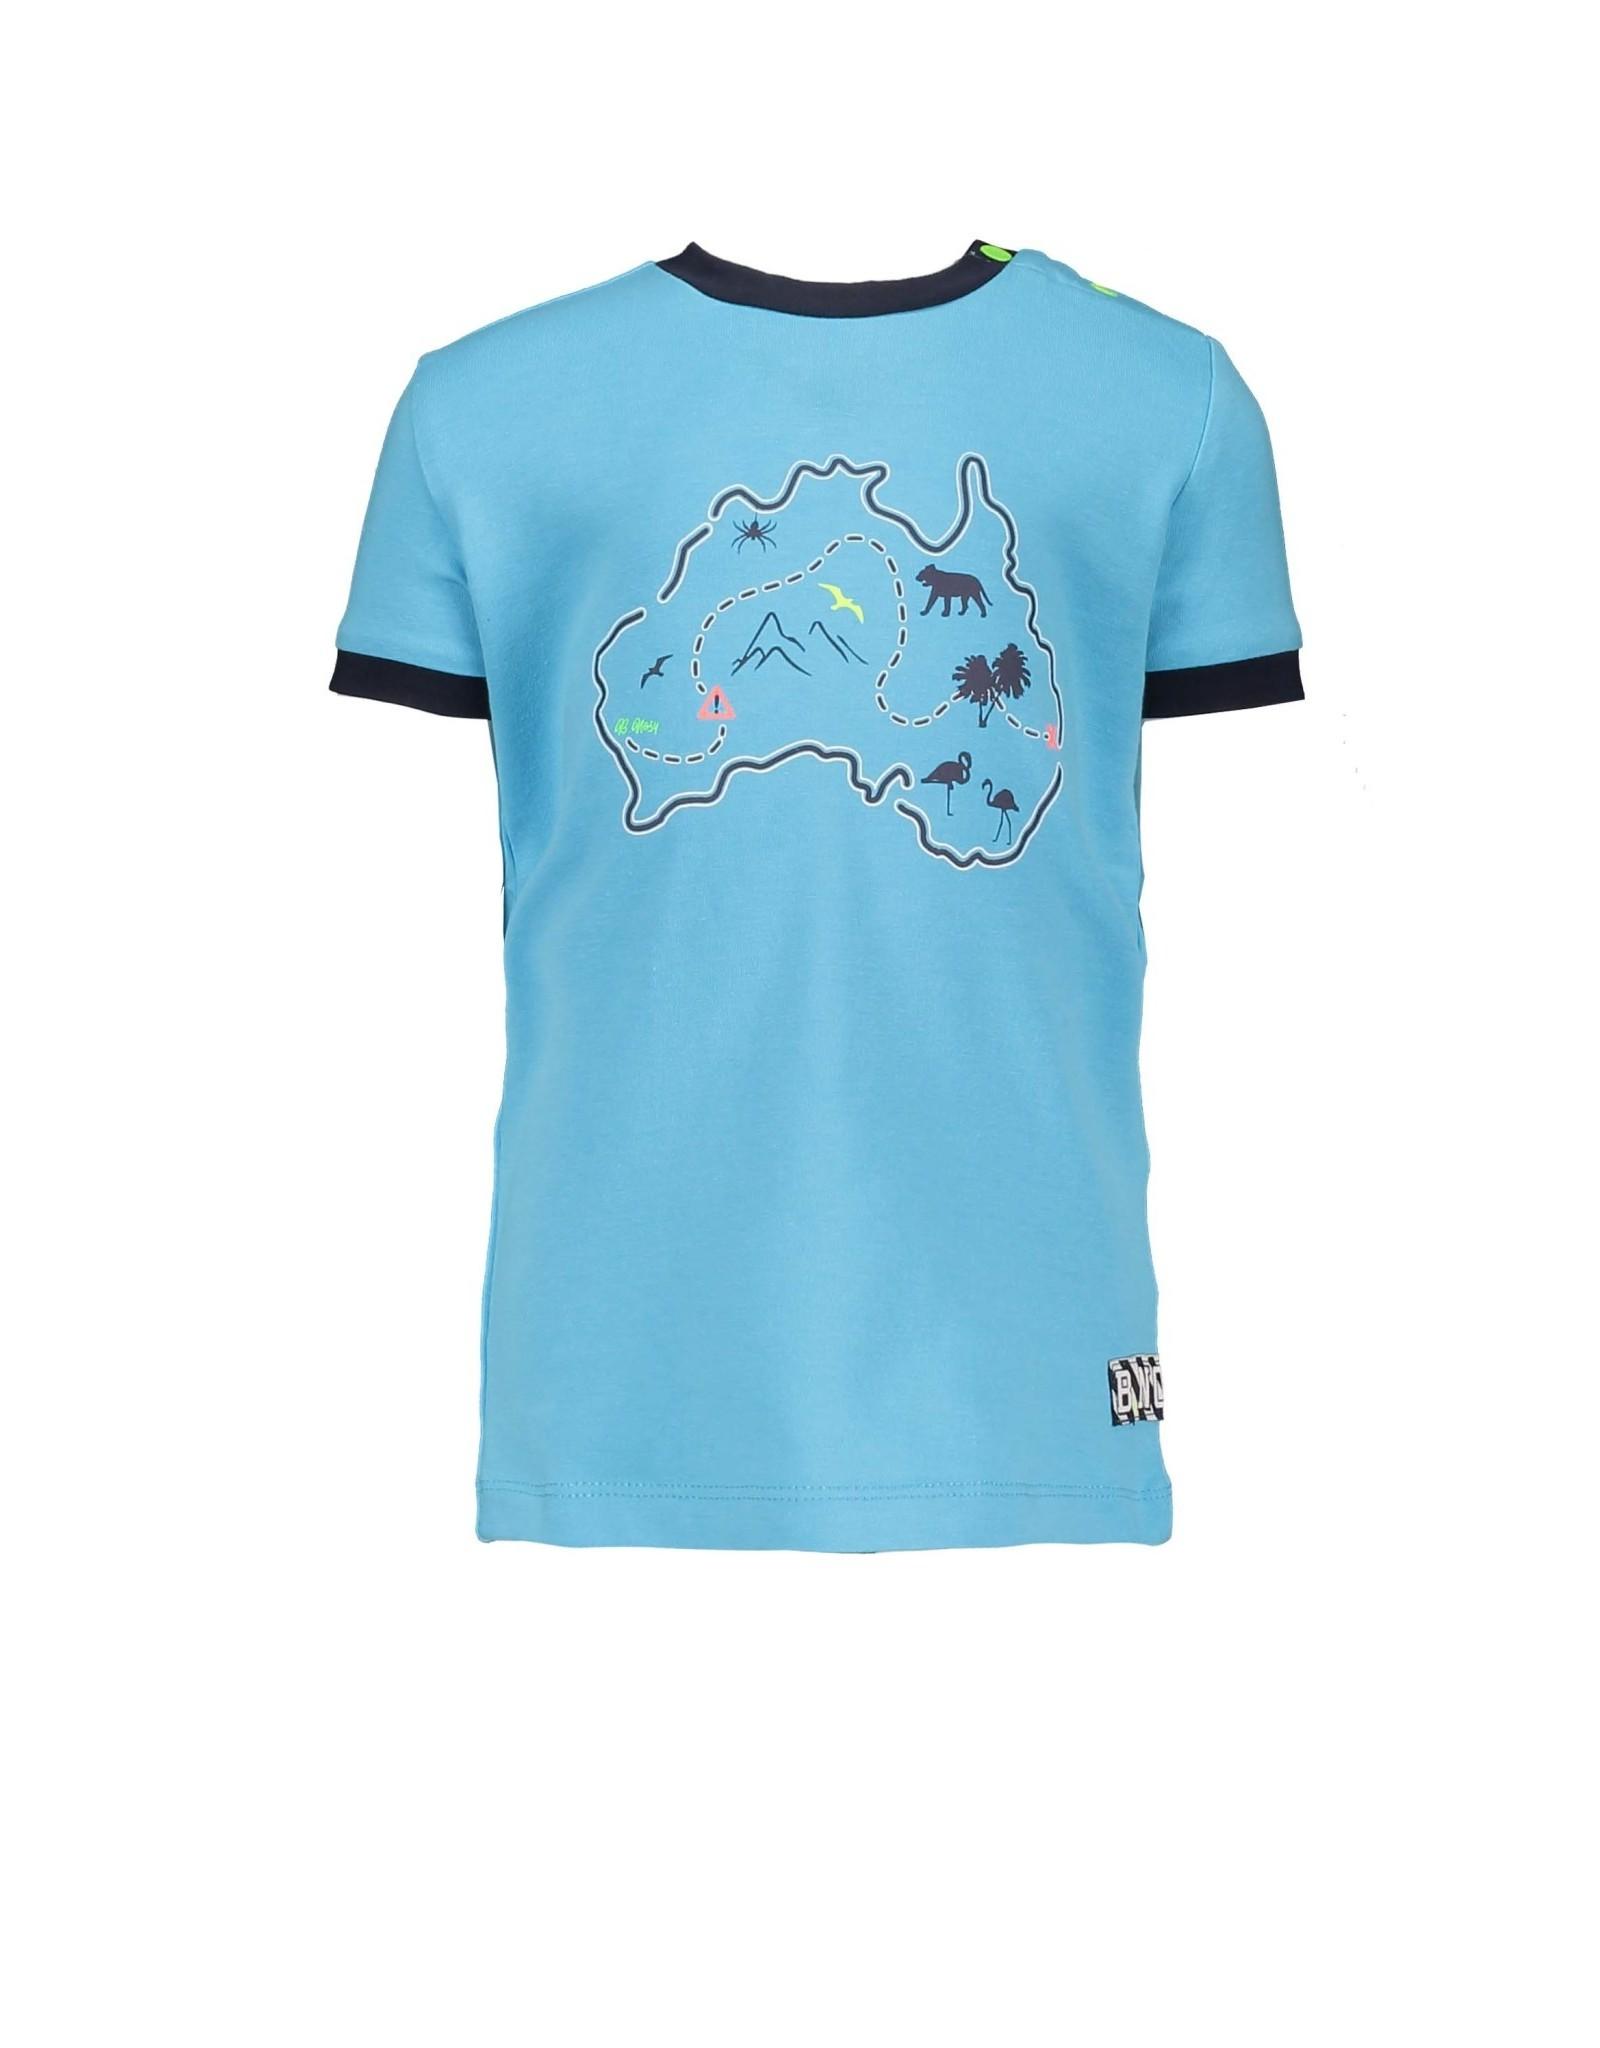 B.Nosy B.Nosy baby jongens t-shirt met landkaart Maya Blue